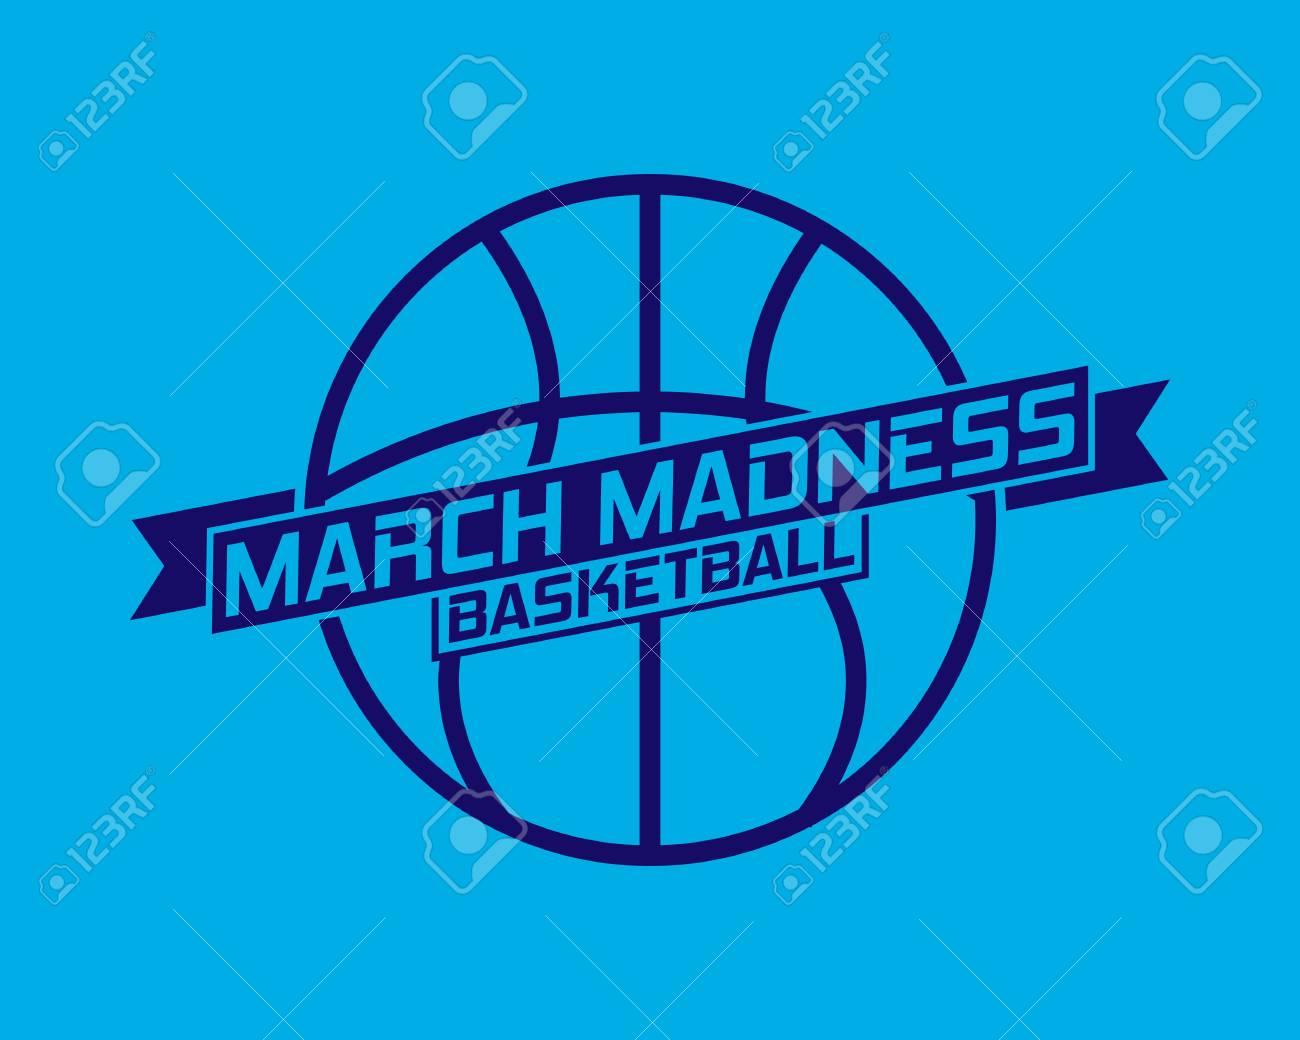 March Madness basketball sport design. Basketball tournament logo, emblem, designs with basketball ball. - 115918031